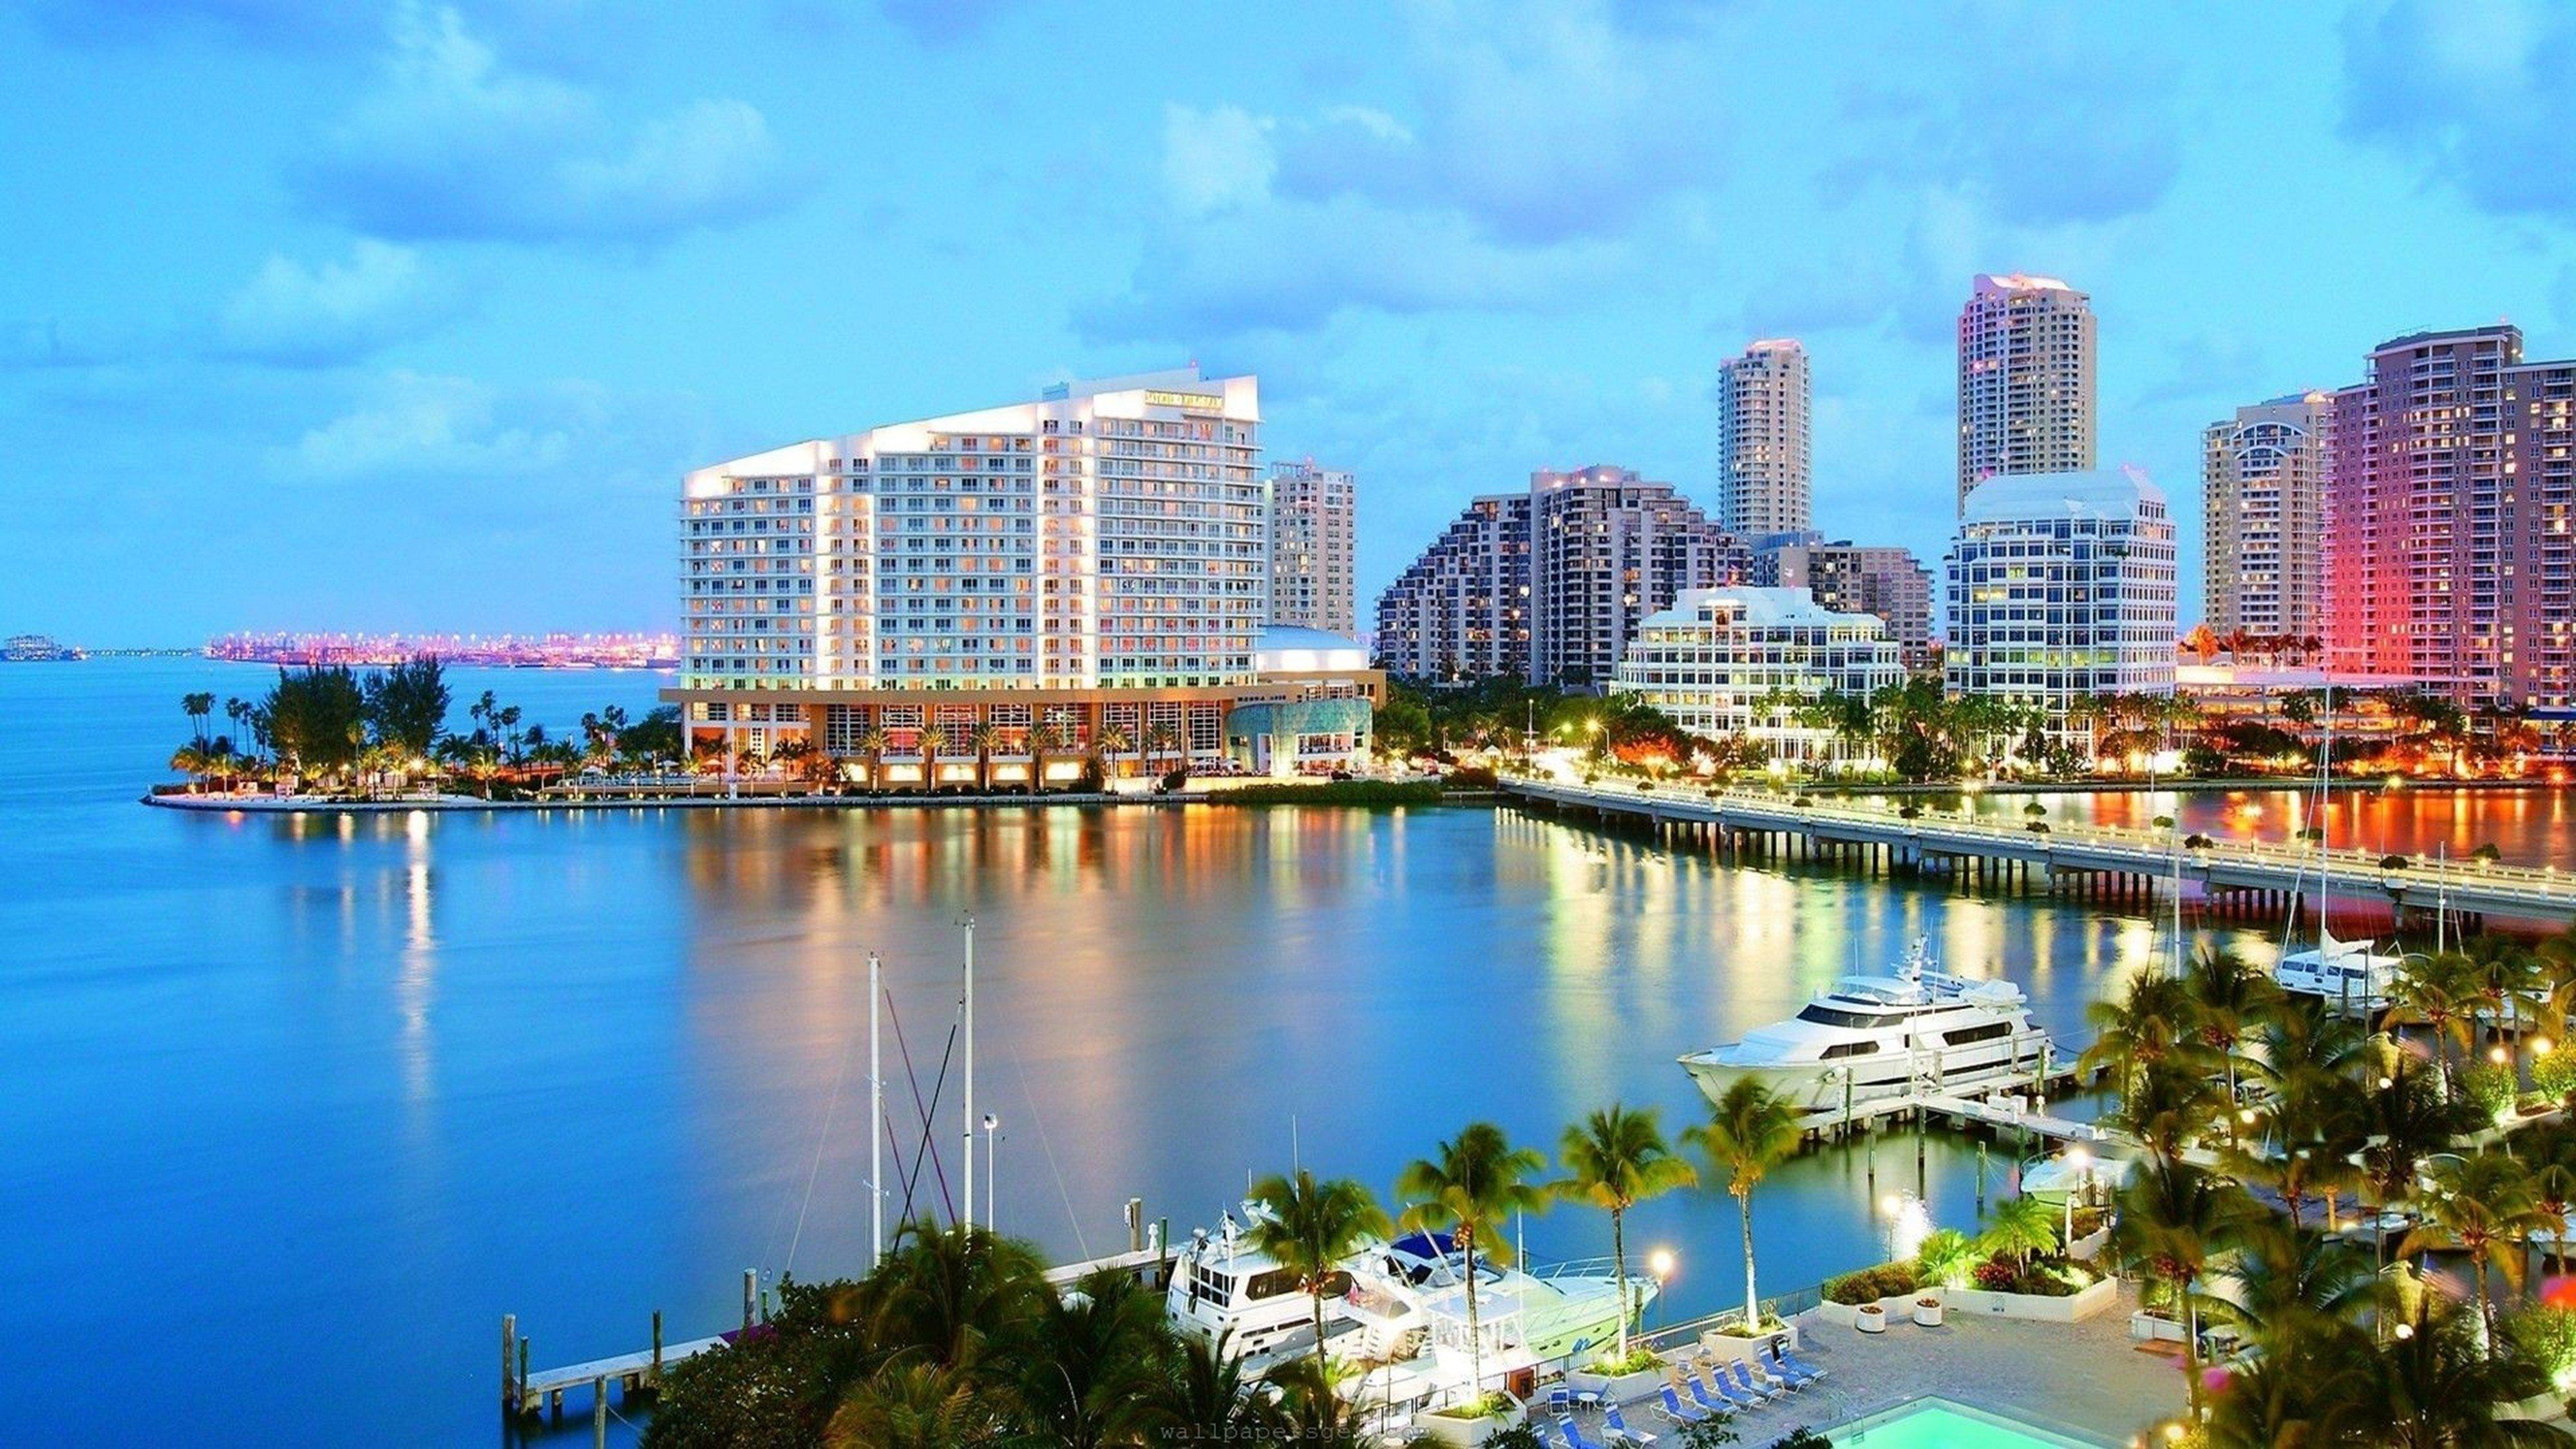 Miami Florida city beach ocean sea 4000x2250 wallpaper 4000x2250 4000x2250